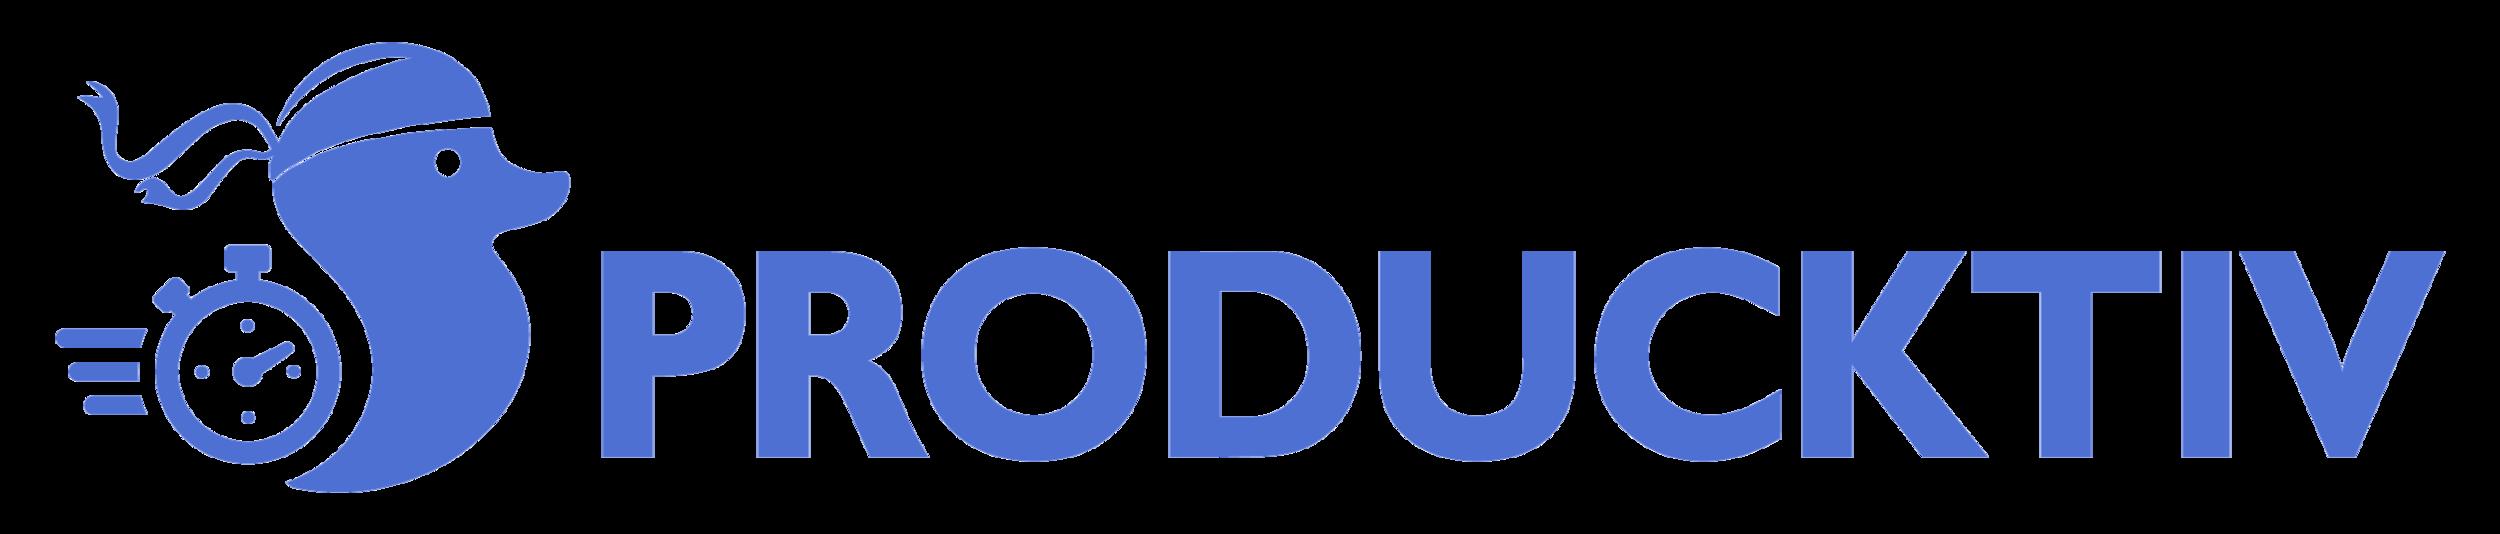 producktiv_logo_new.png